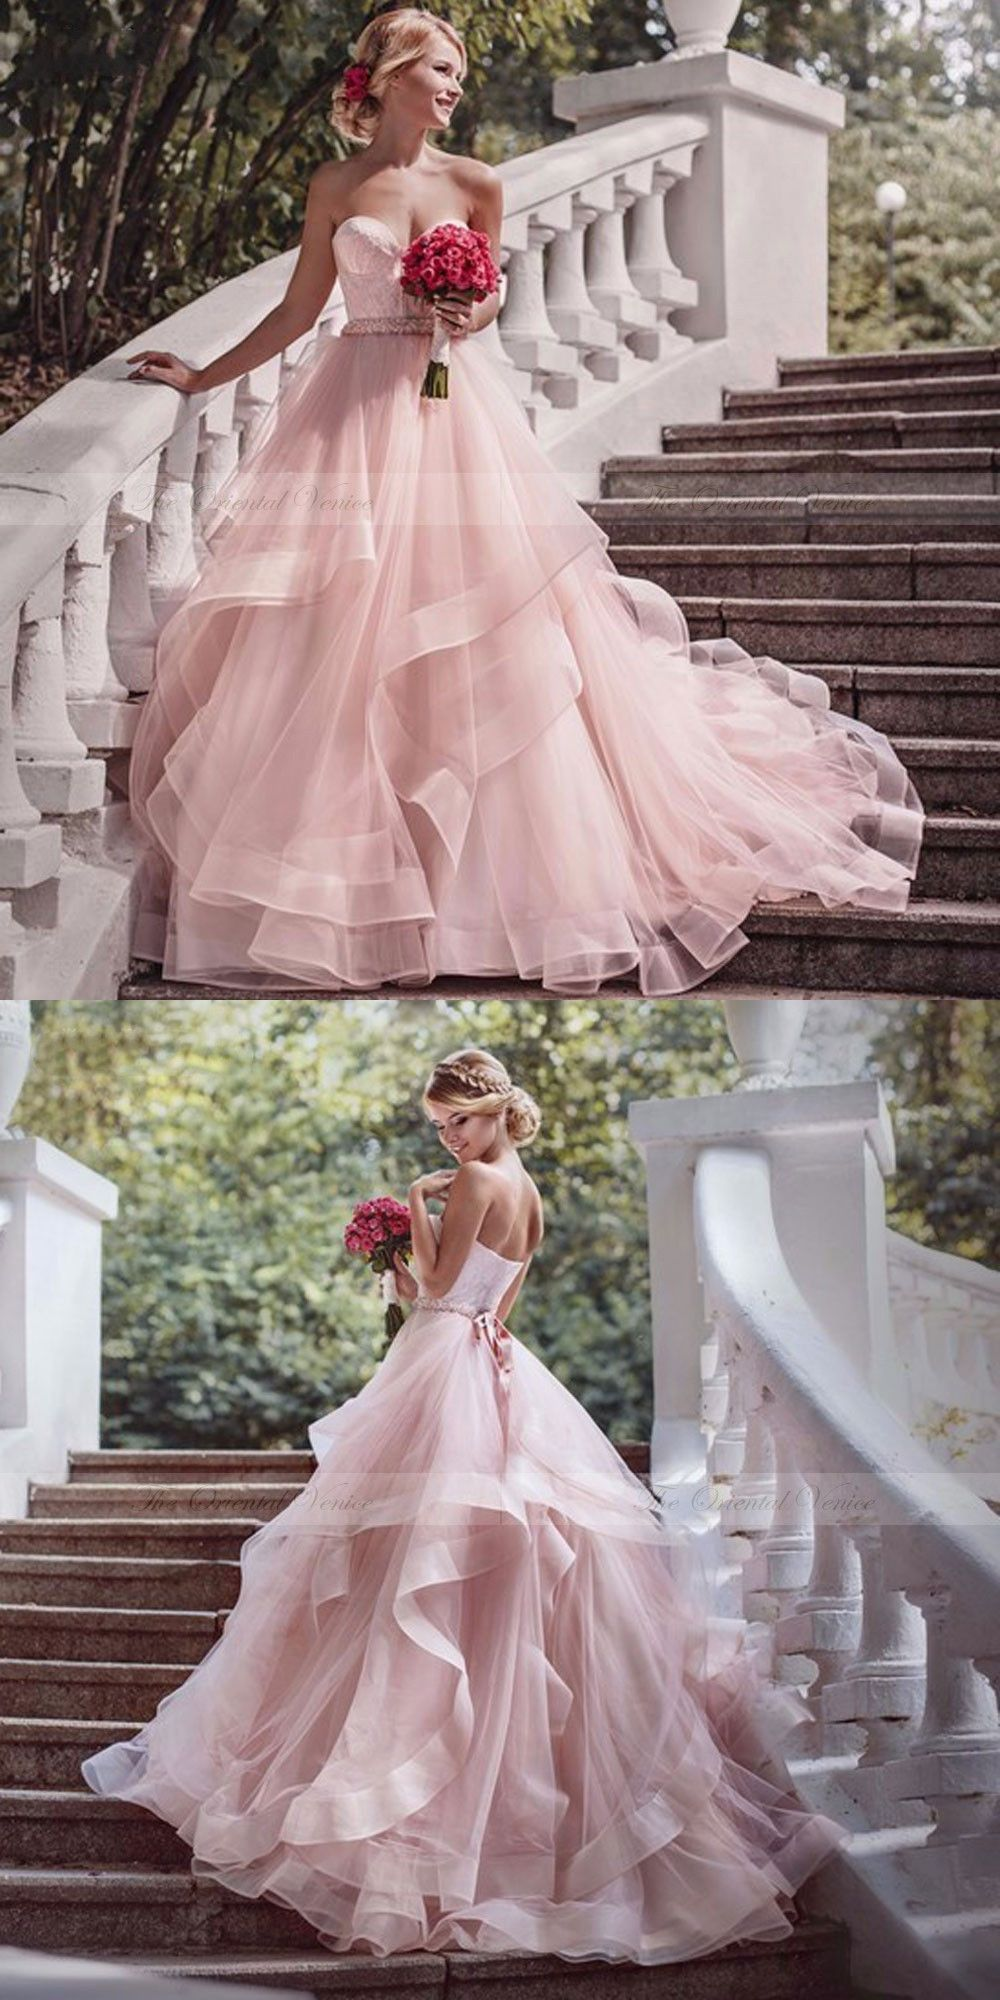 fe92903680b bridal dress 15 schöne rosa Brautkleider